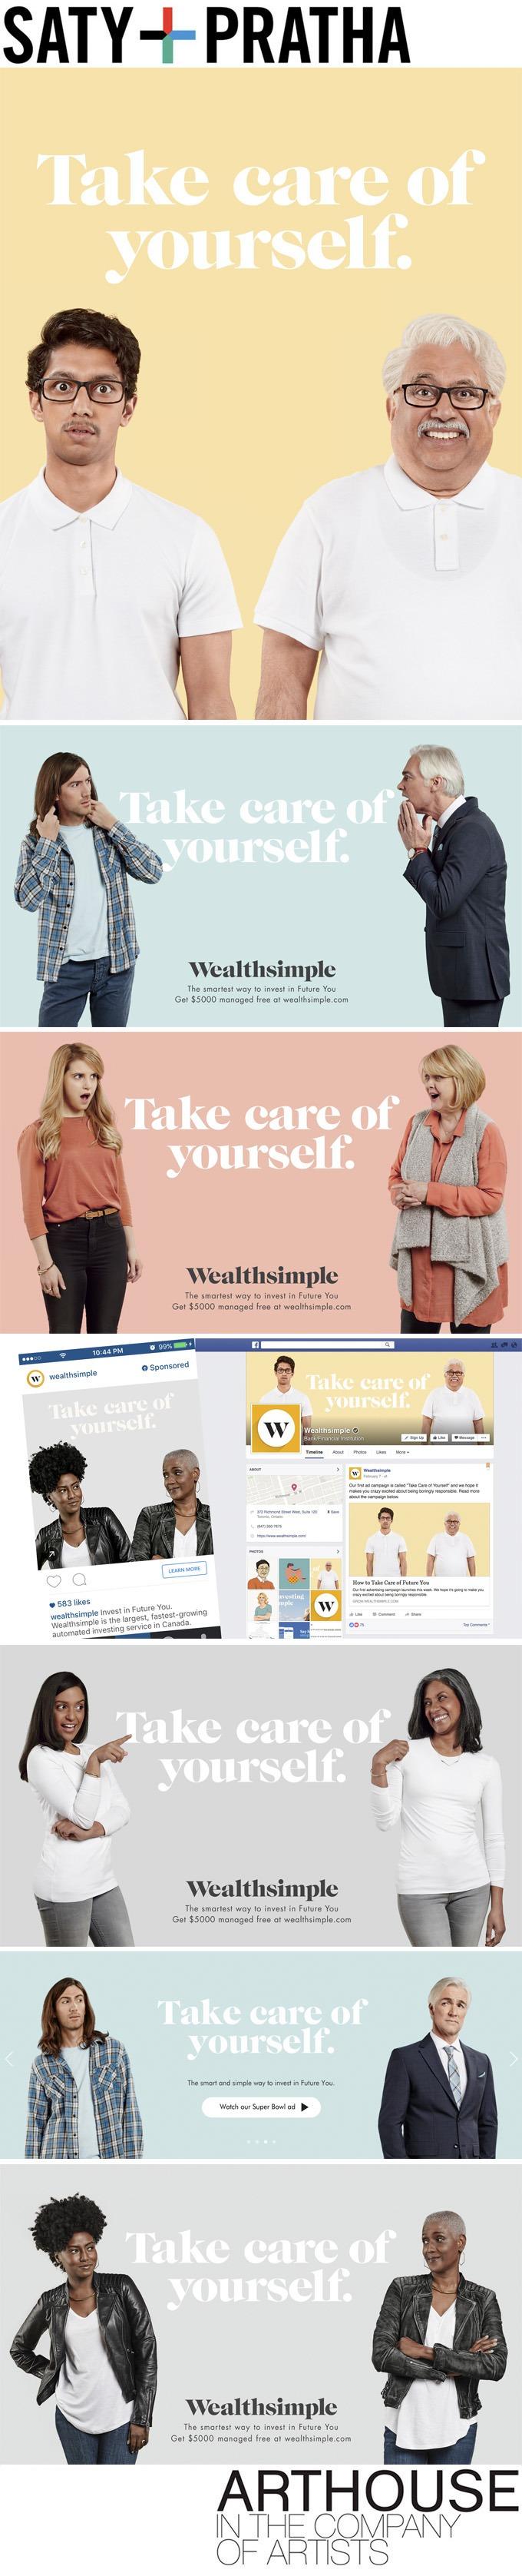 Saty+Pratha_Wealthsimple_Ad_Campaign